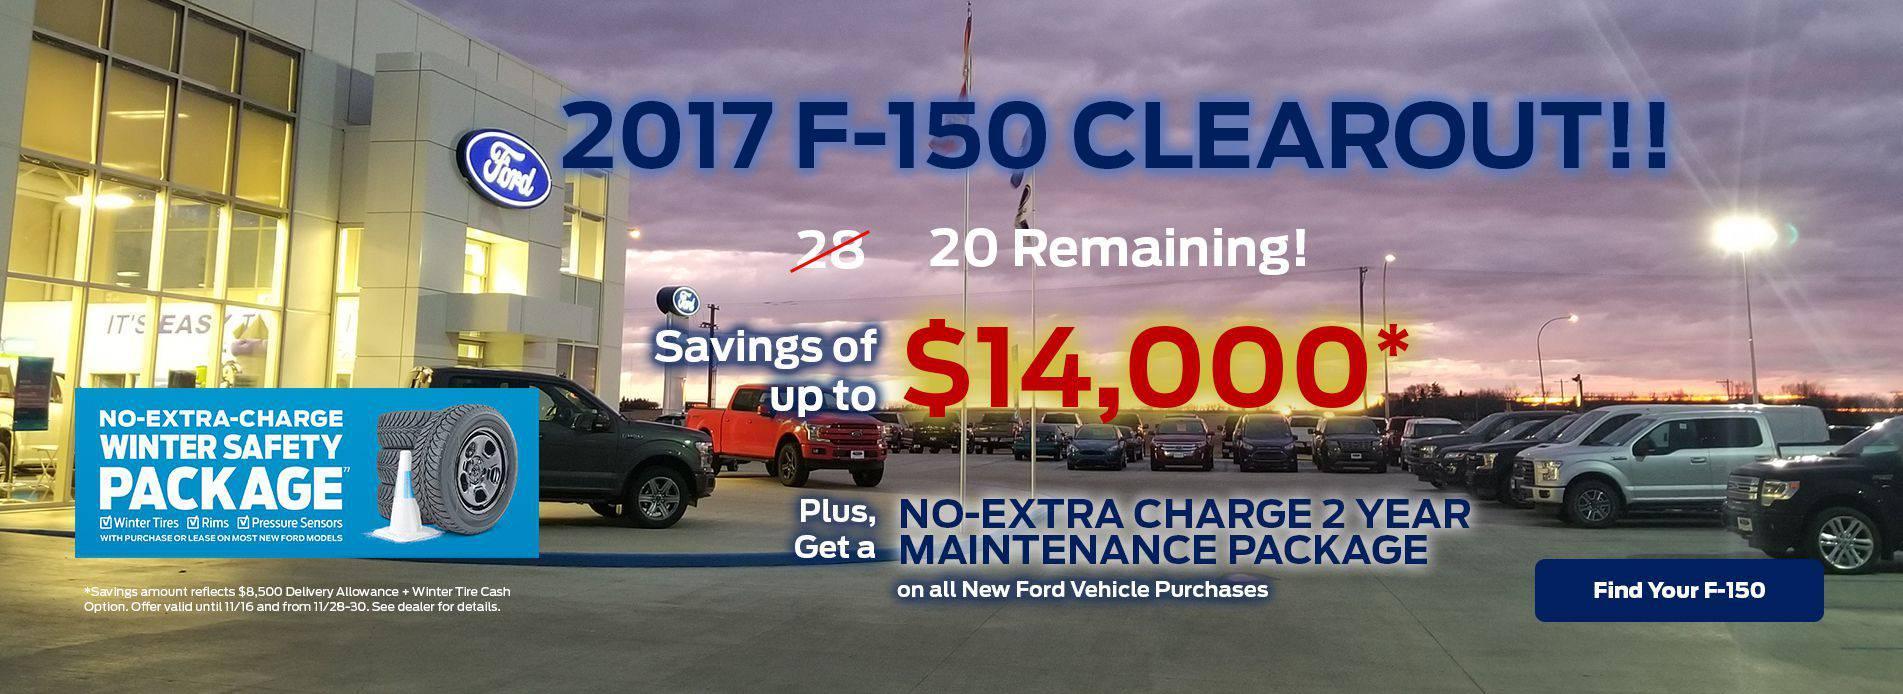 2017 F-150 Clearance